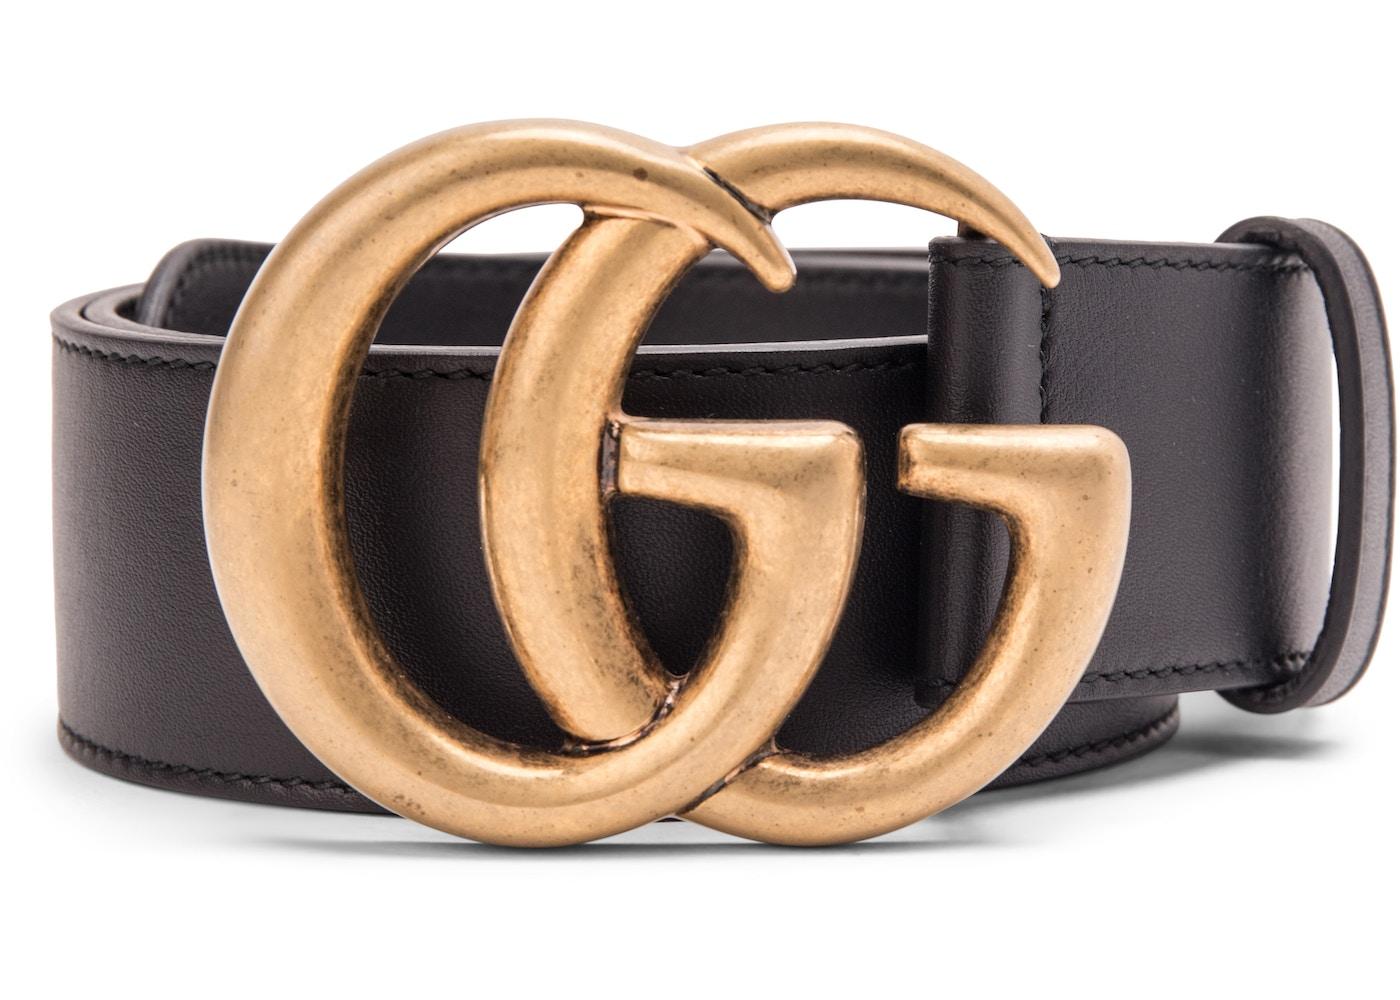 147973fb Gucci Double G Buckle Leather Belt 1.5 Width 70-28 Black